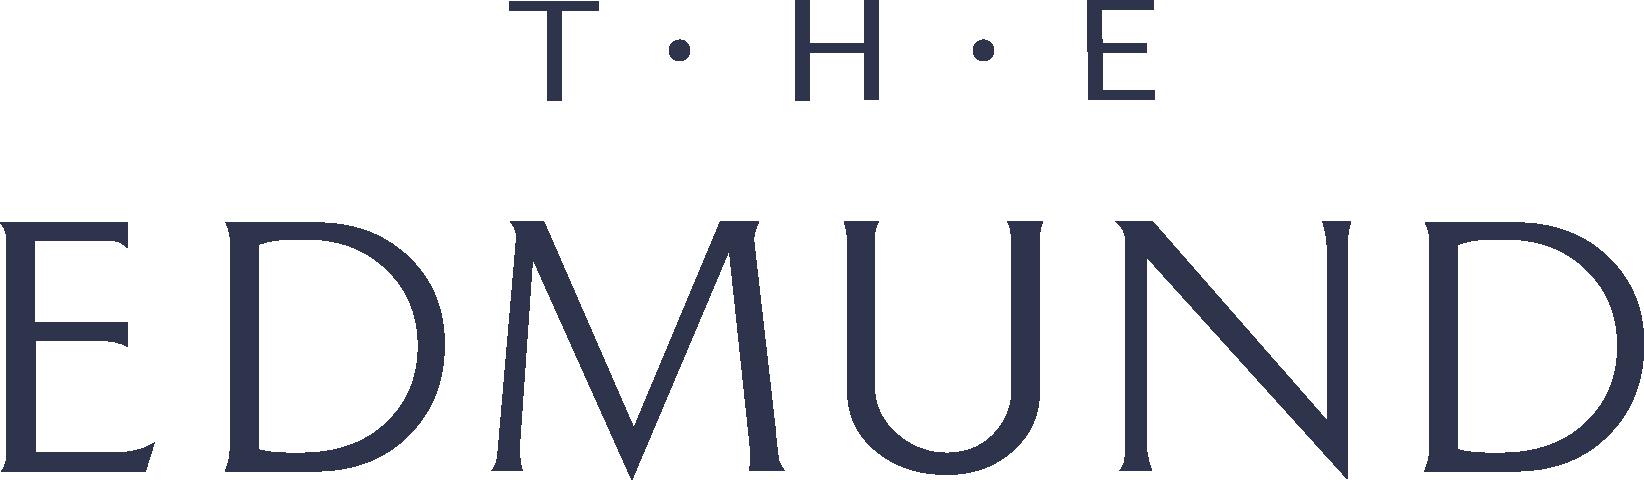 The Edmund logo